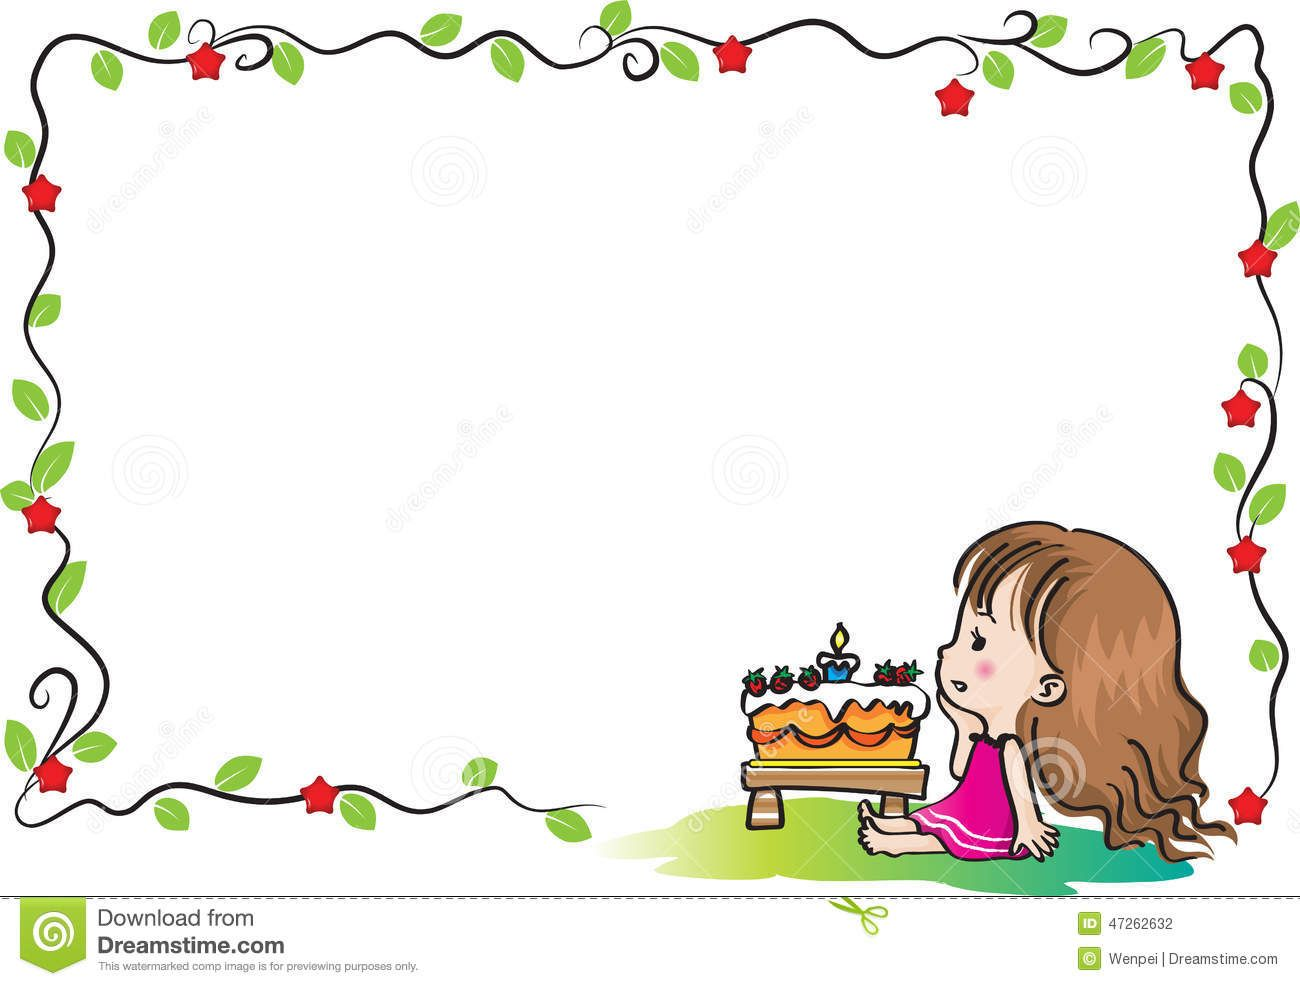 Happy birthday card border frame vector drawing cartoon 47262632 happy birthday card border frame vector drawing cartoon bookmarktalkfo Image collections